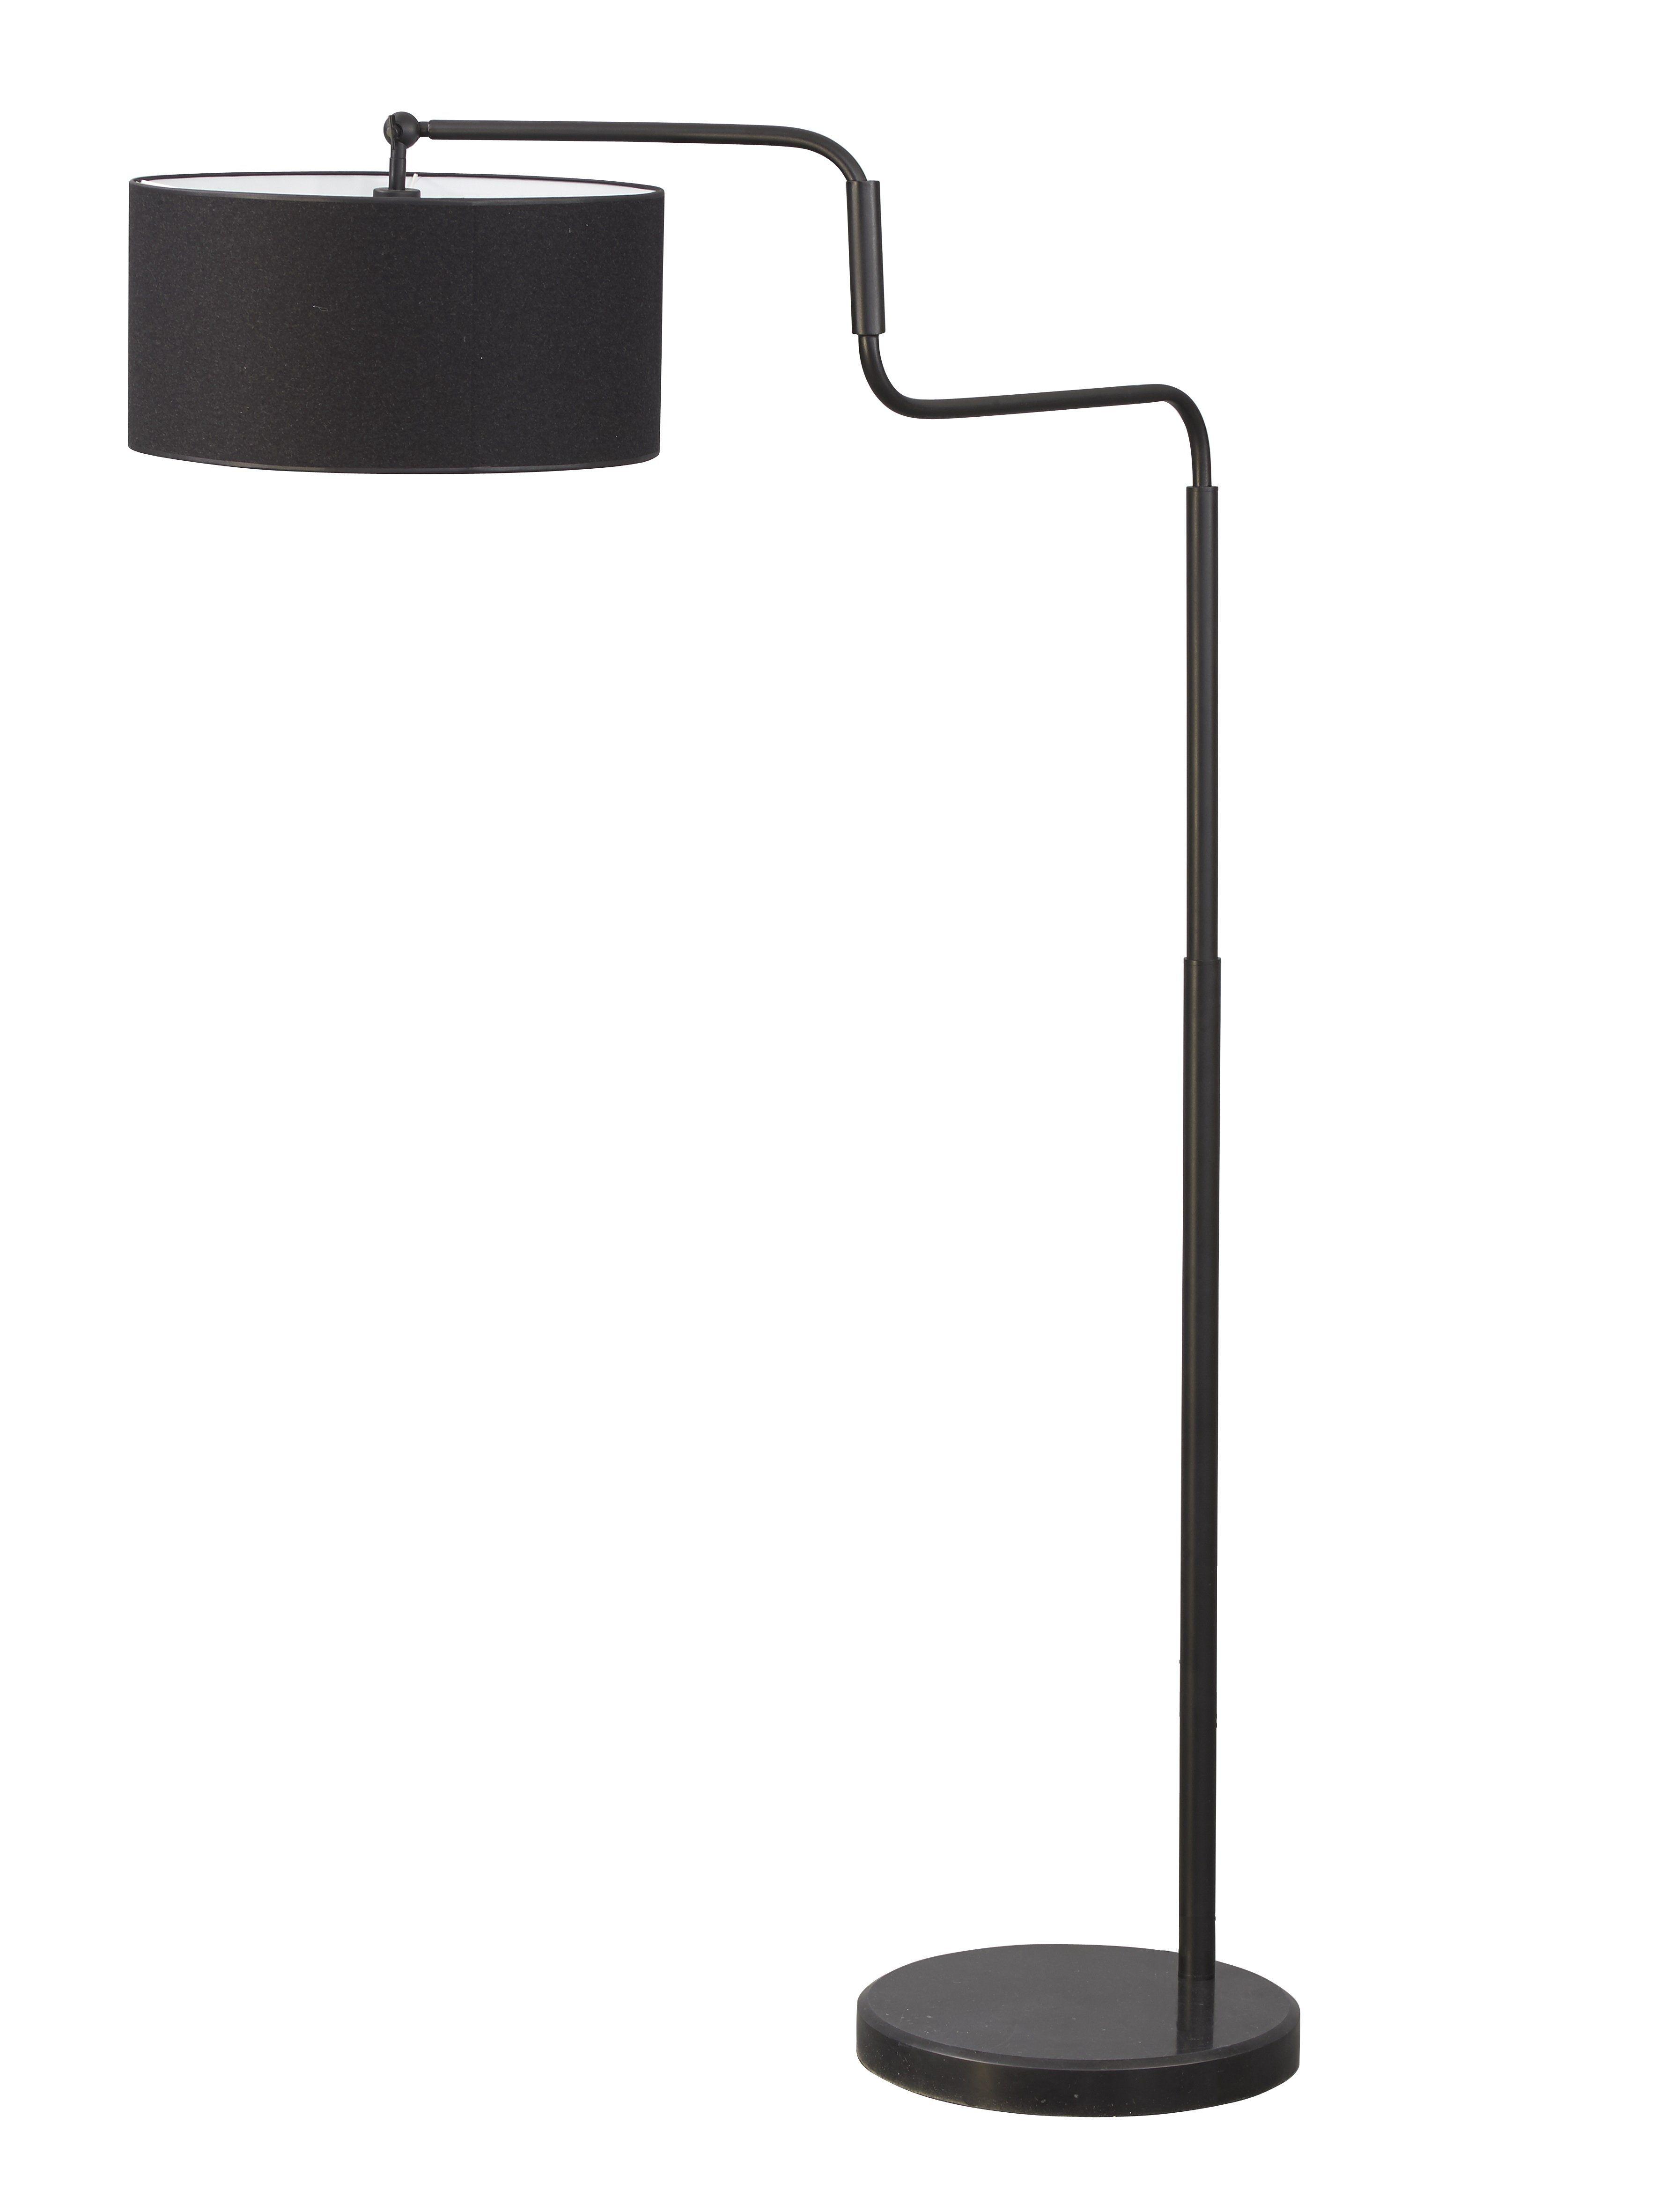 Home sweet home vloerlamp Grant - zwart - excl. kap